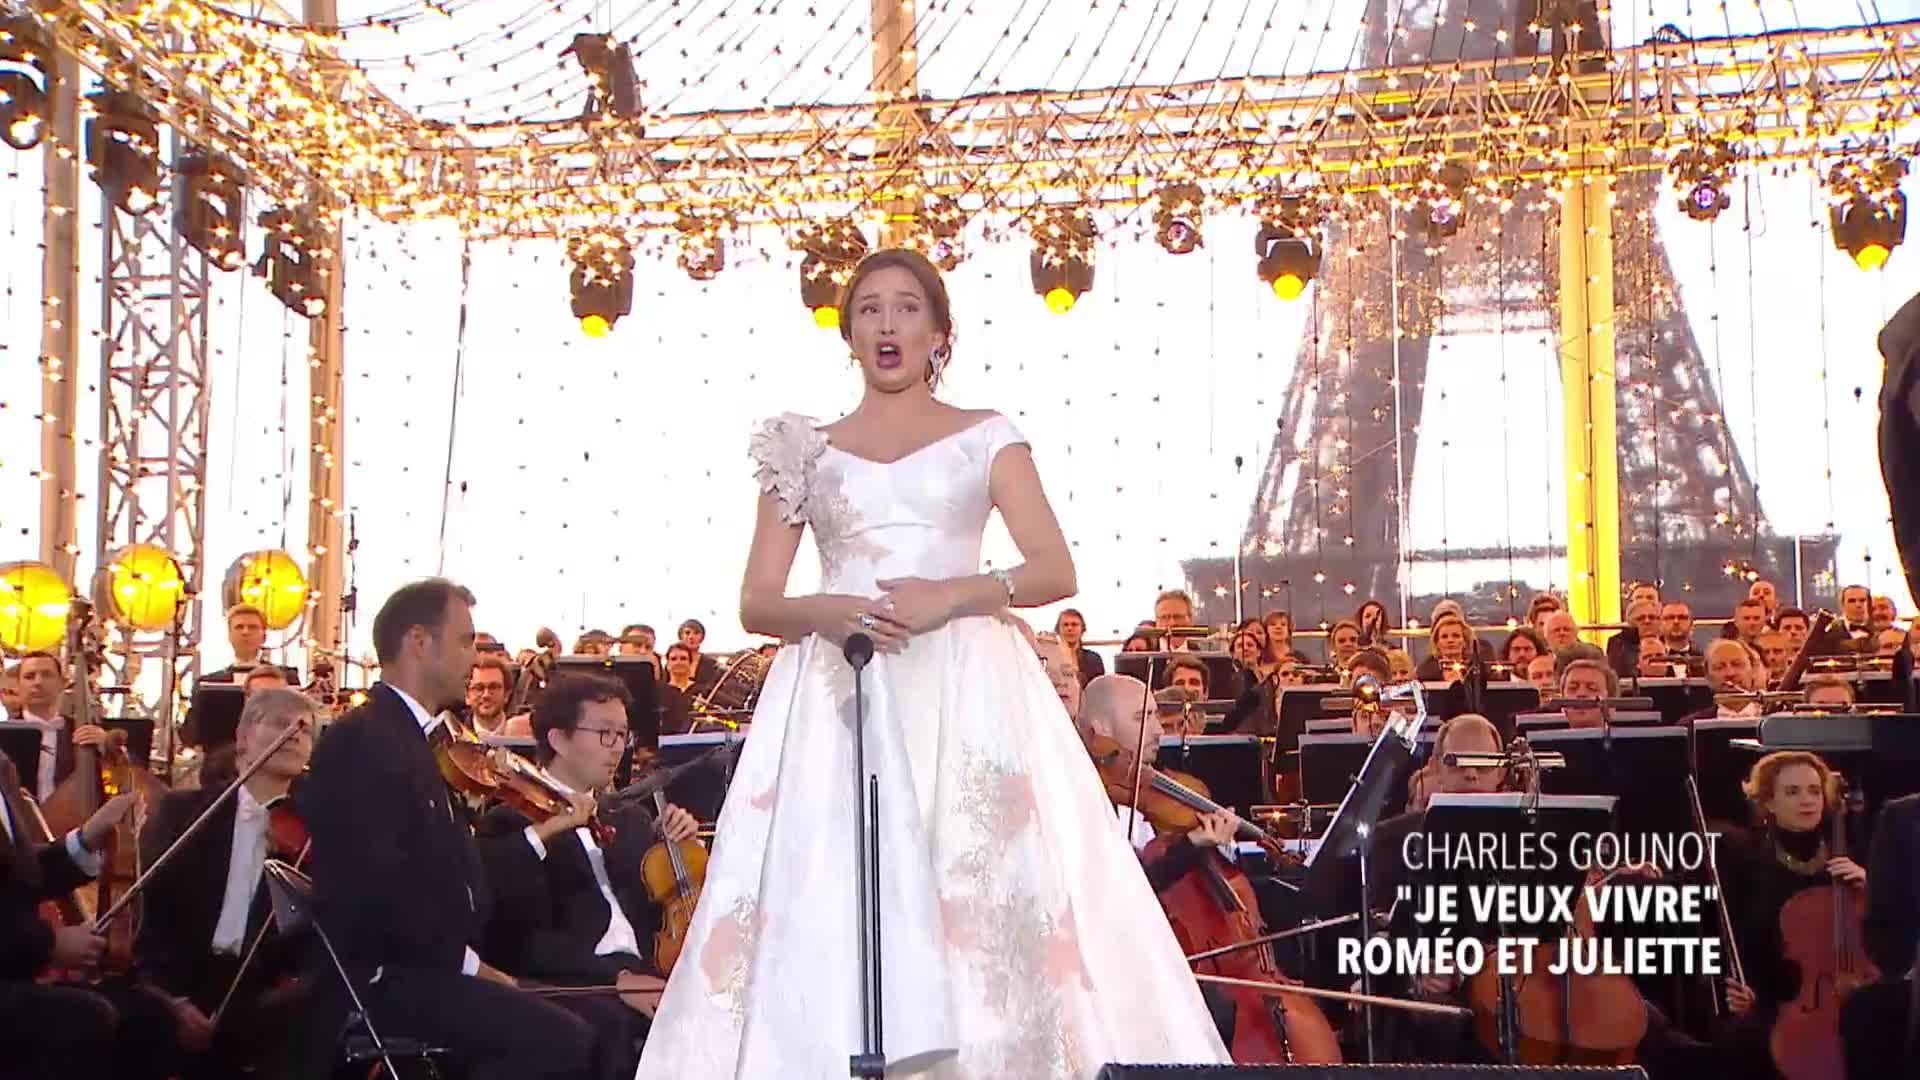 Aida Garifullina, Charles Gounod - Ah, je veux vivre dans ce rève (Montage)